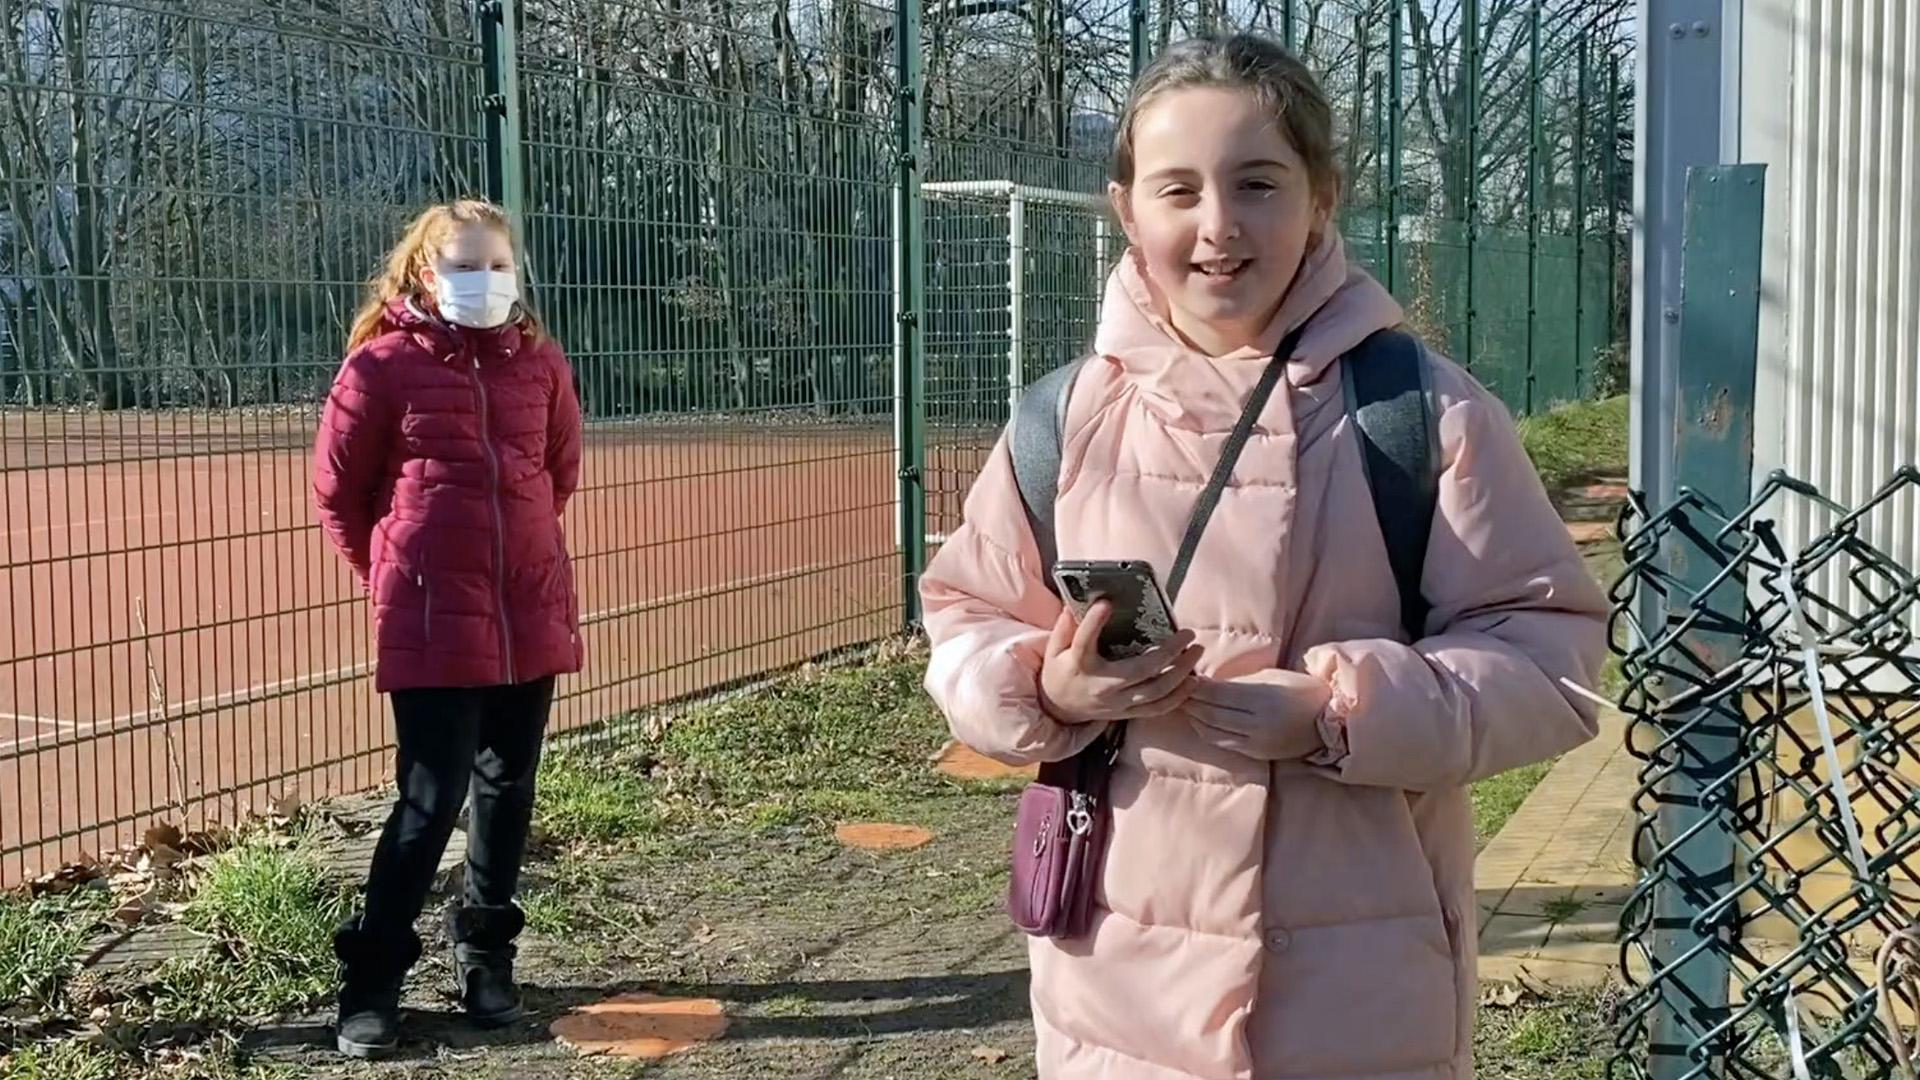 Schulzeitungs-Reporterin Dilara-Josefine befragt Mia aus der 456d zum Raumwandler-Projekt